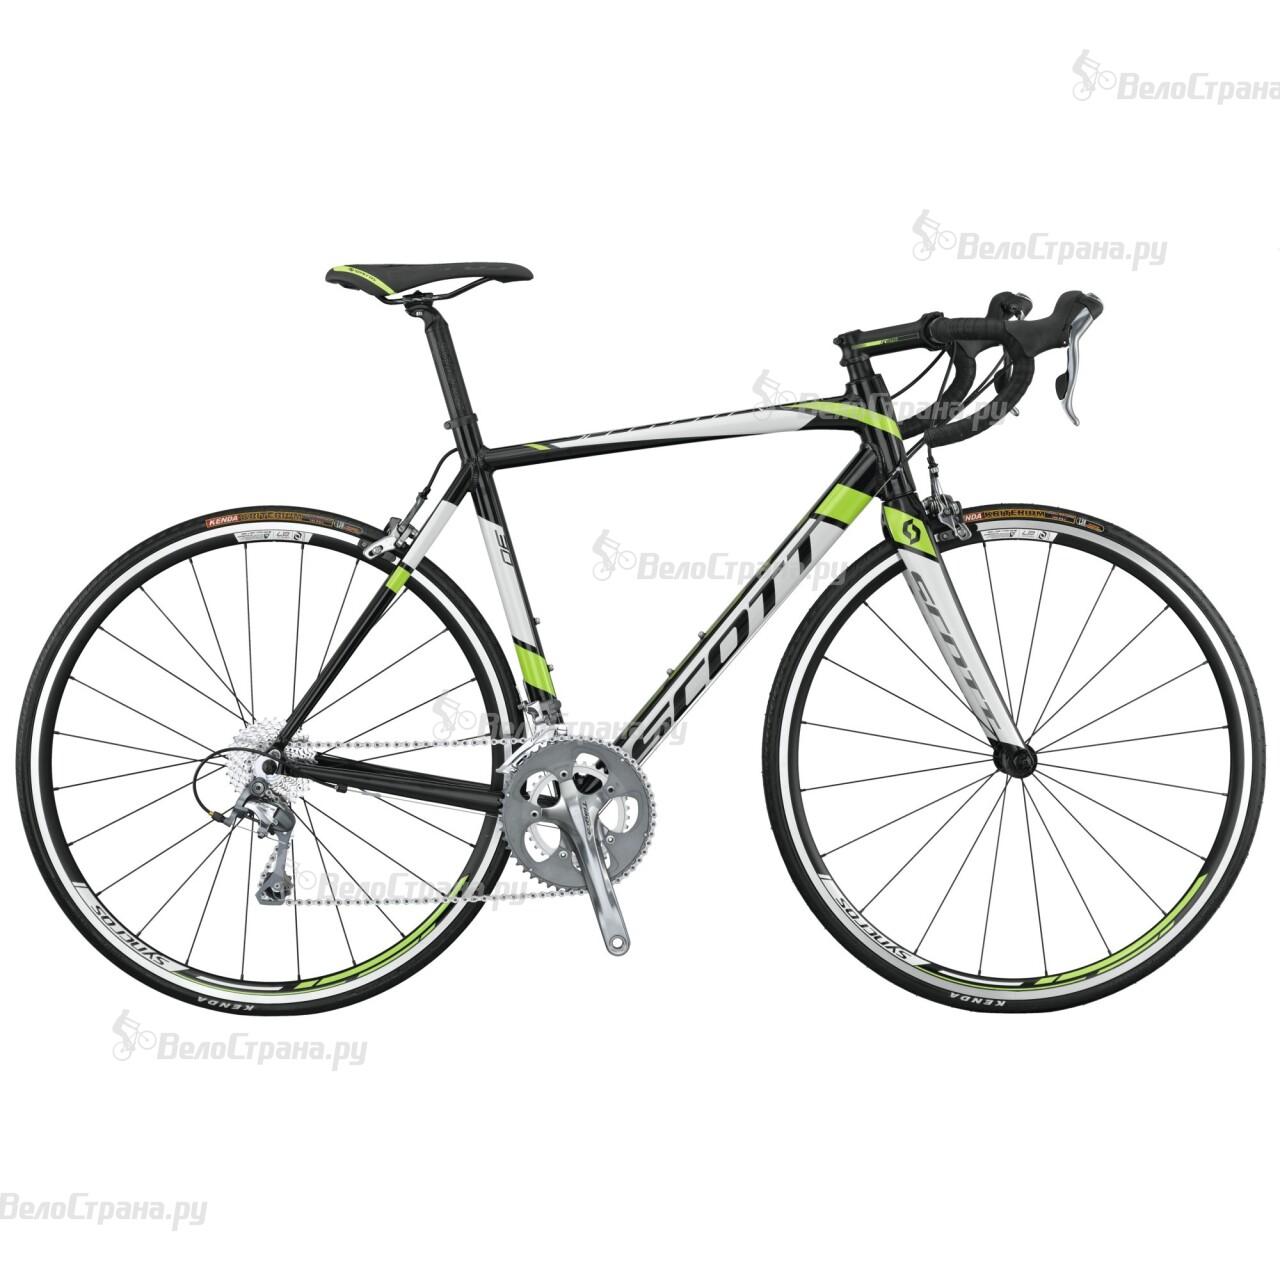 Велосипед Scott Speedster 30 Compact (2015) велосипед scott speedster 30 disc 2016